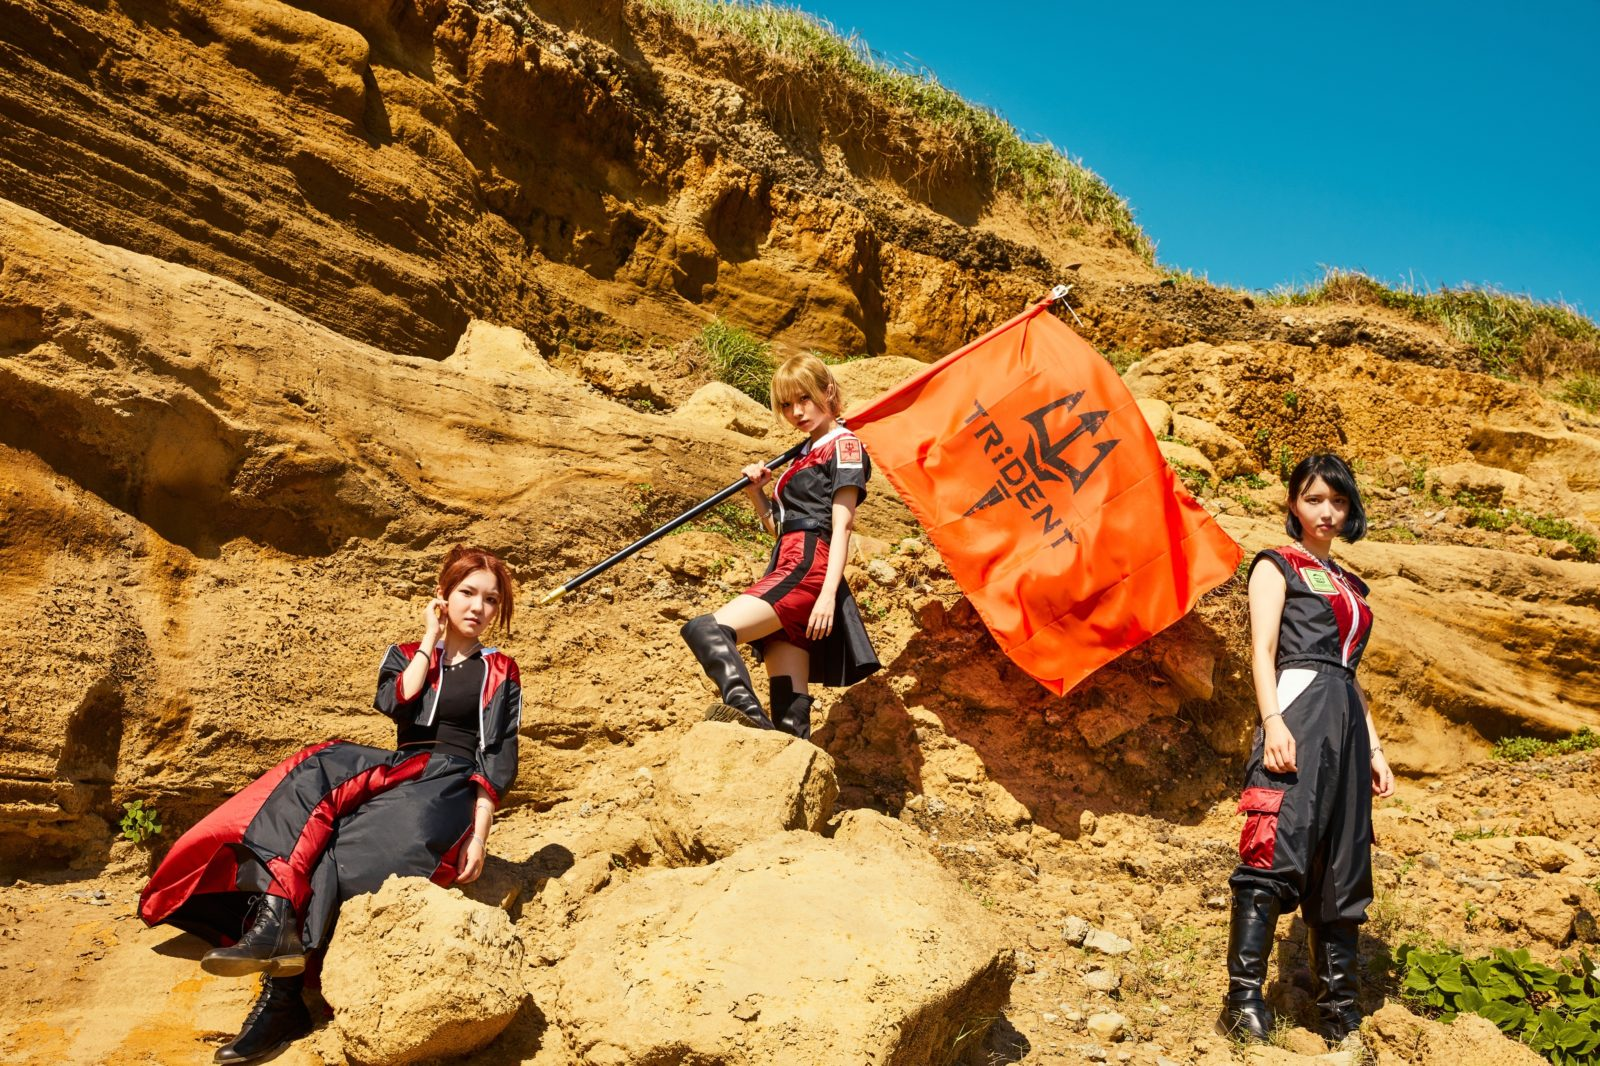 TRiDENT(ex-ガールズロックバンド革命)、待望の新曲MV「JUST FIGHT」 を公開サムネイル画像